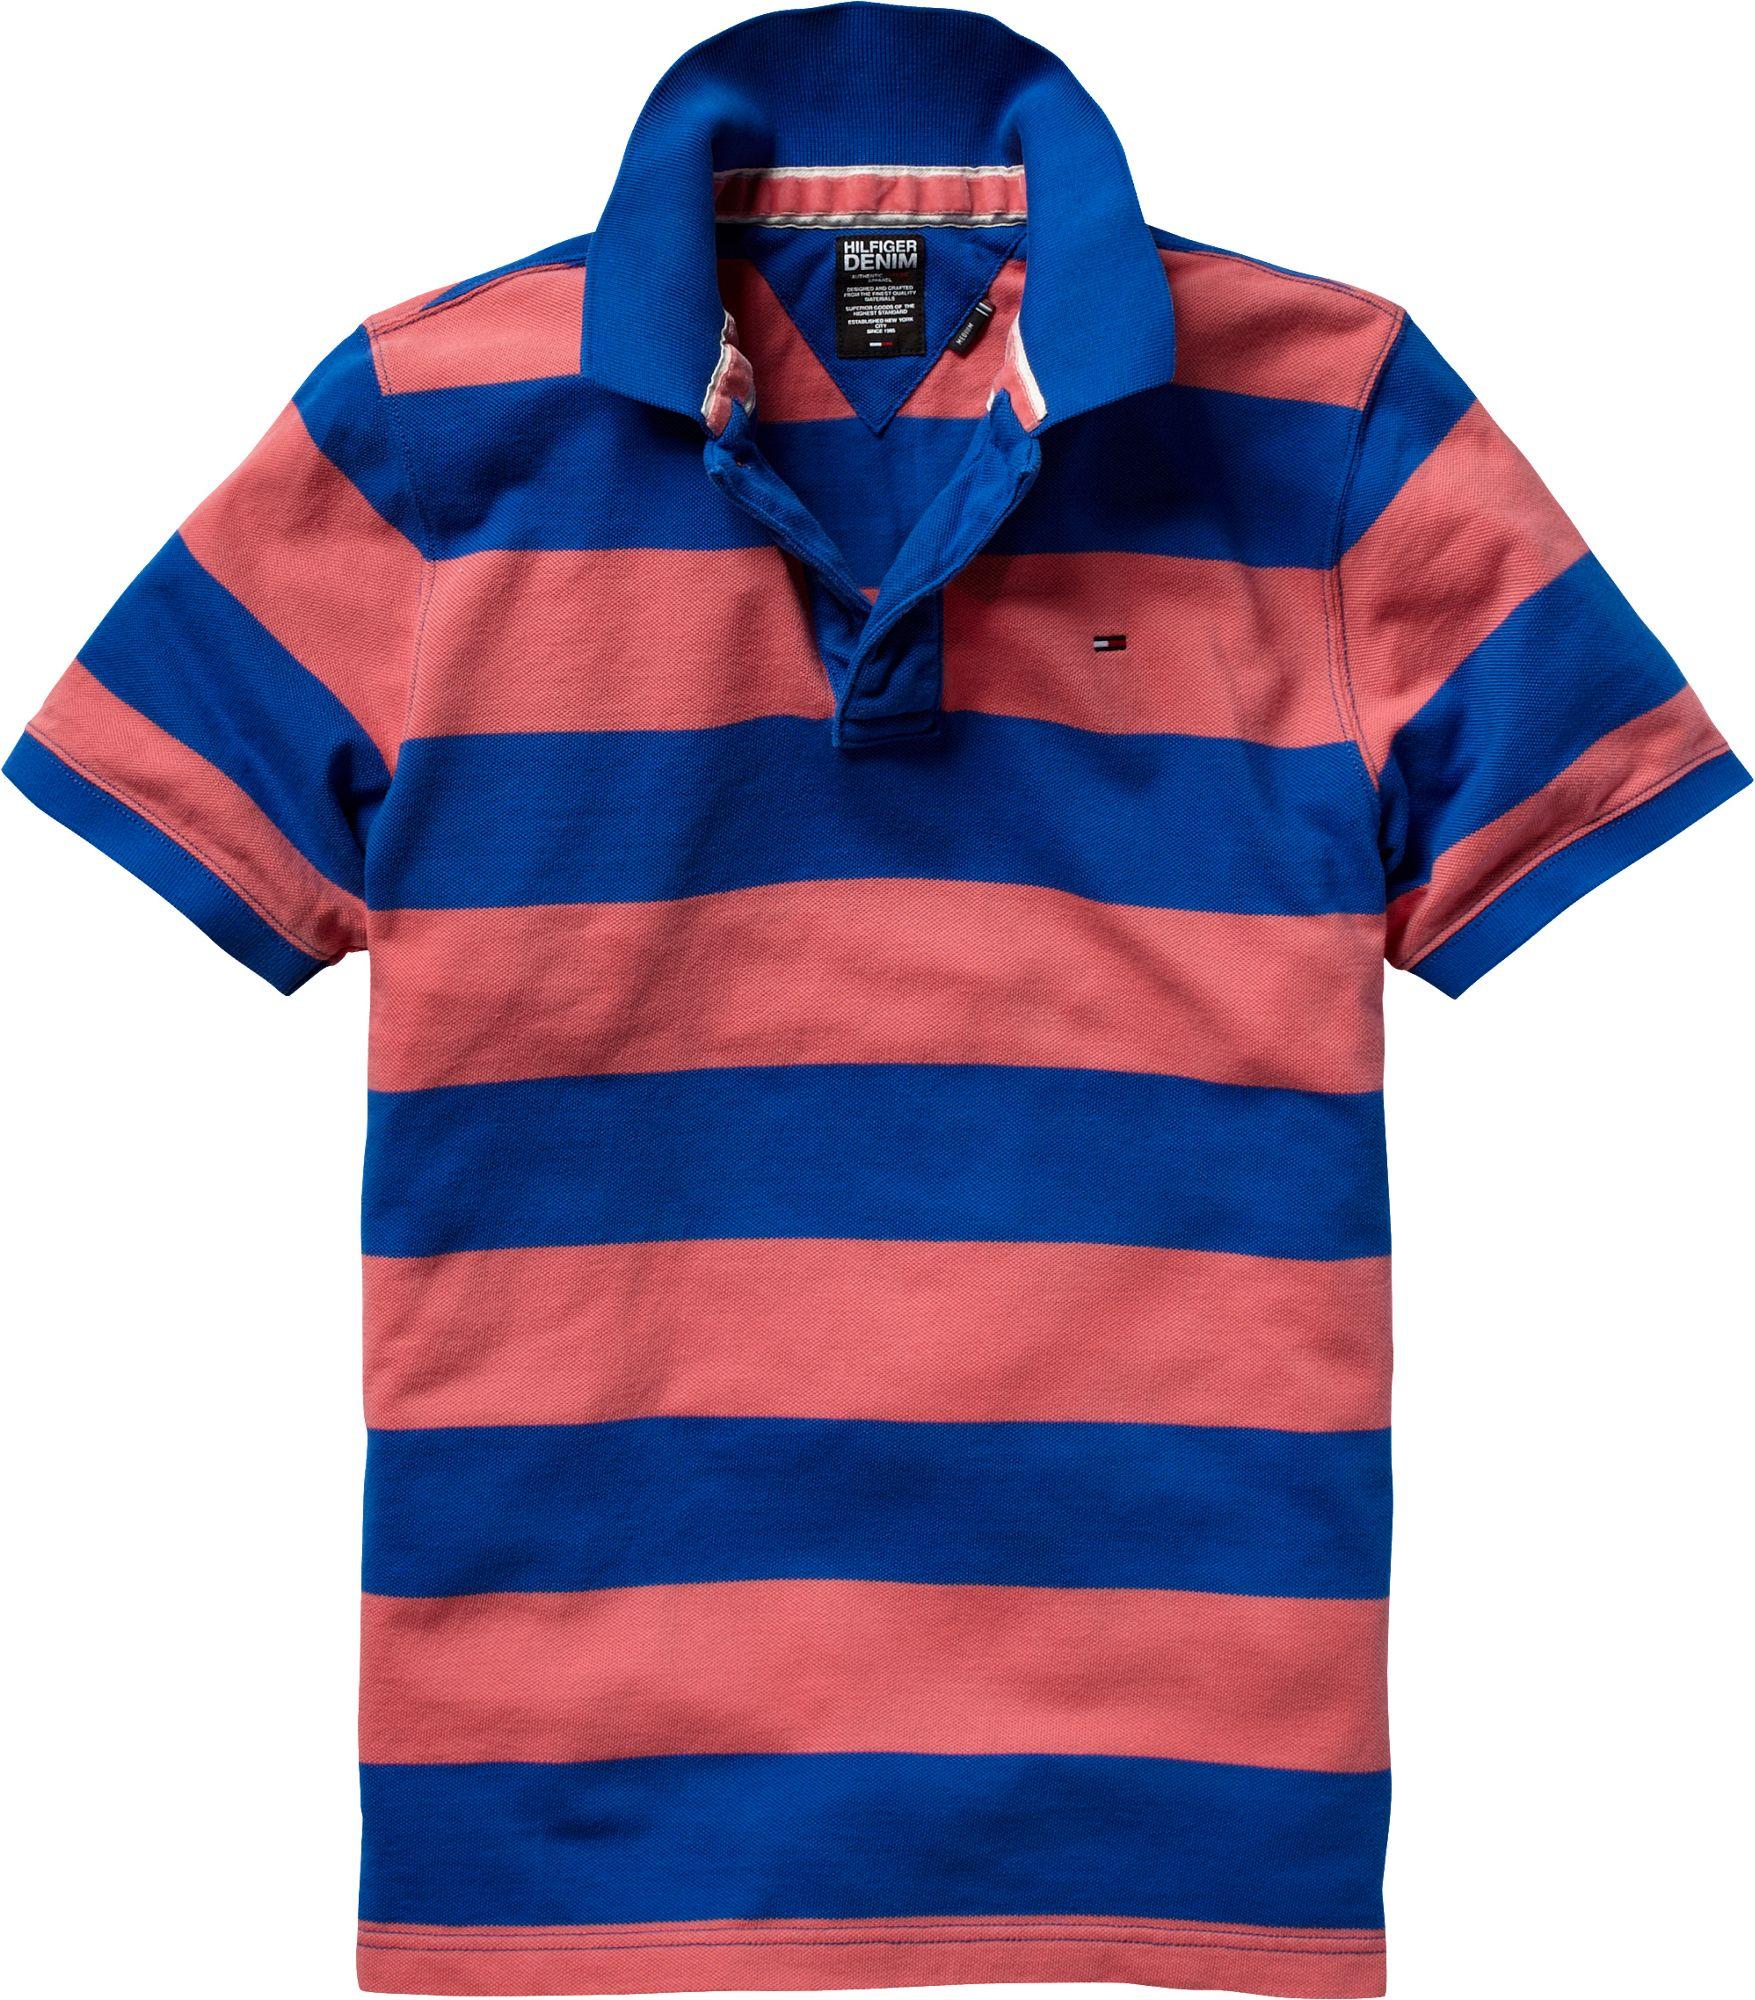 tommy hilfiger pilot striped polo shirt in blue for men lyst. Black Bedroom Furniture Sets. Home Design Ideas